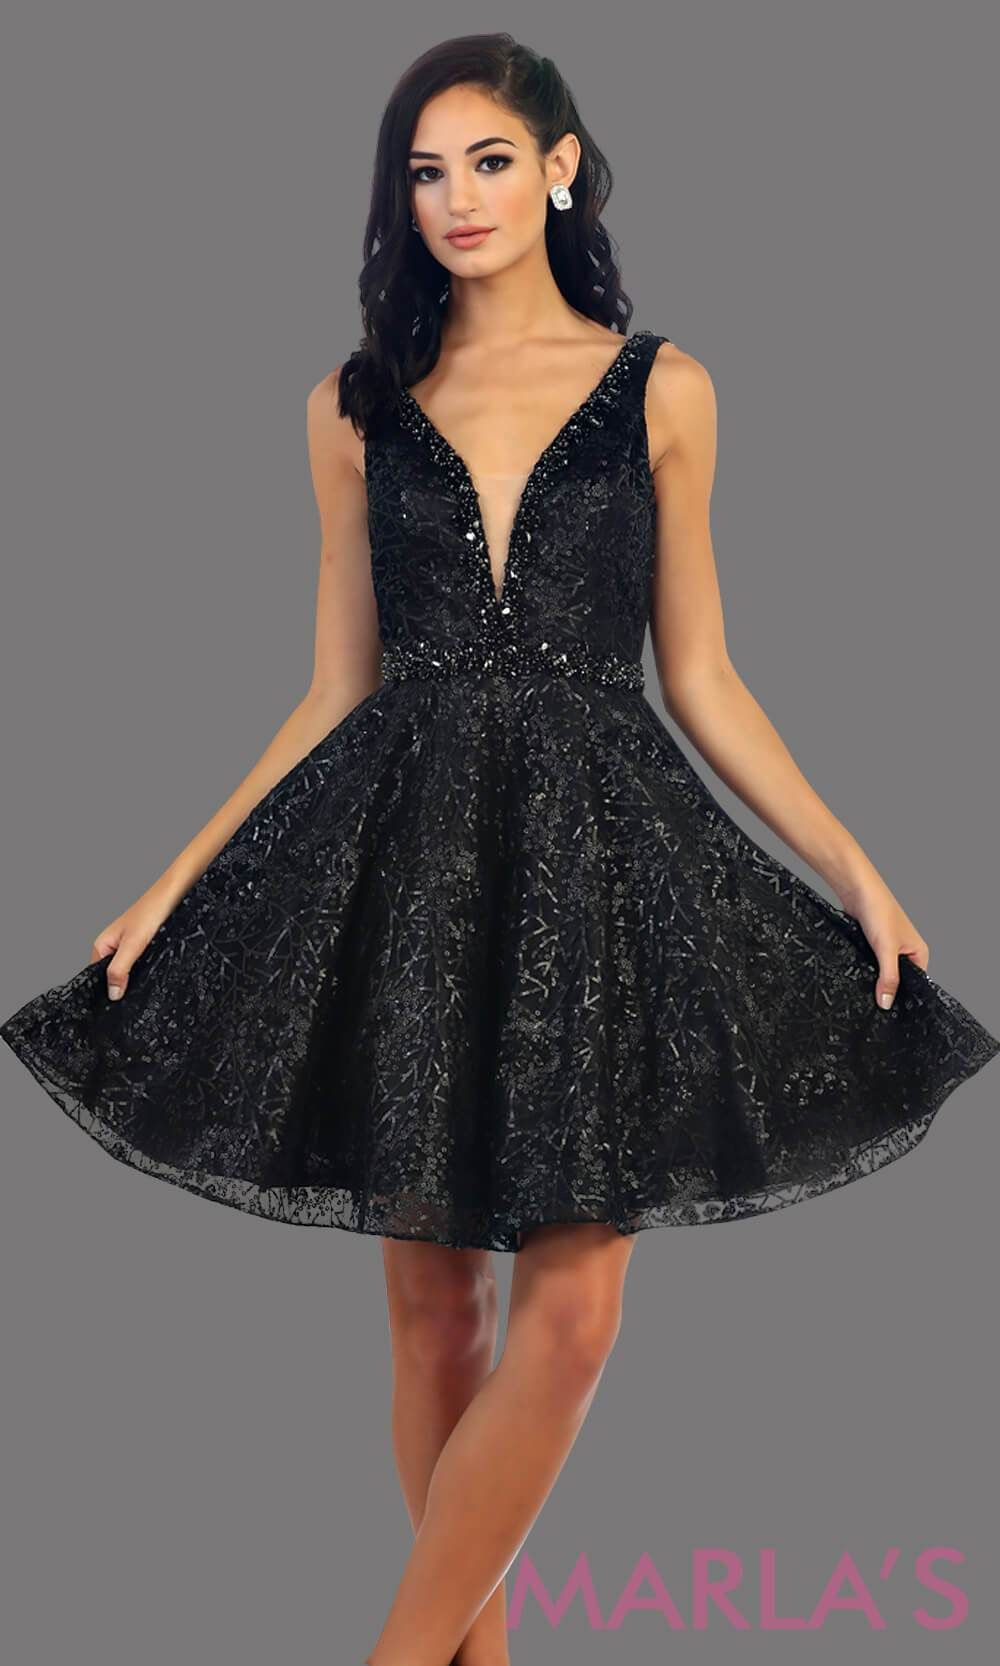 2eddfa0776 7438-Short black dress with deep V neck and back. This is a perfect grade 8  grad dress